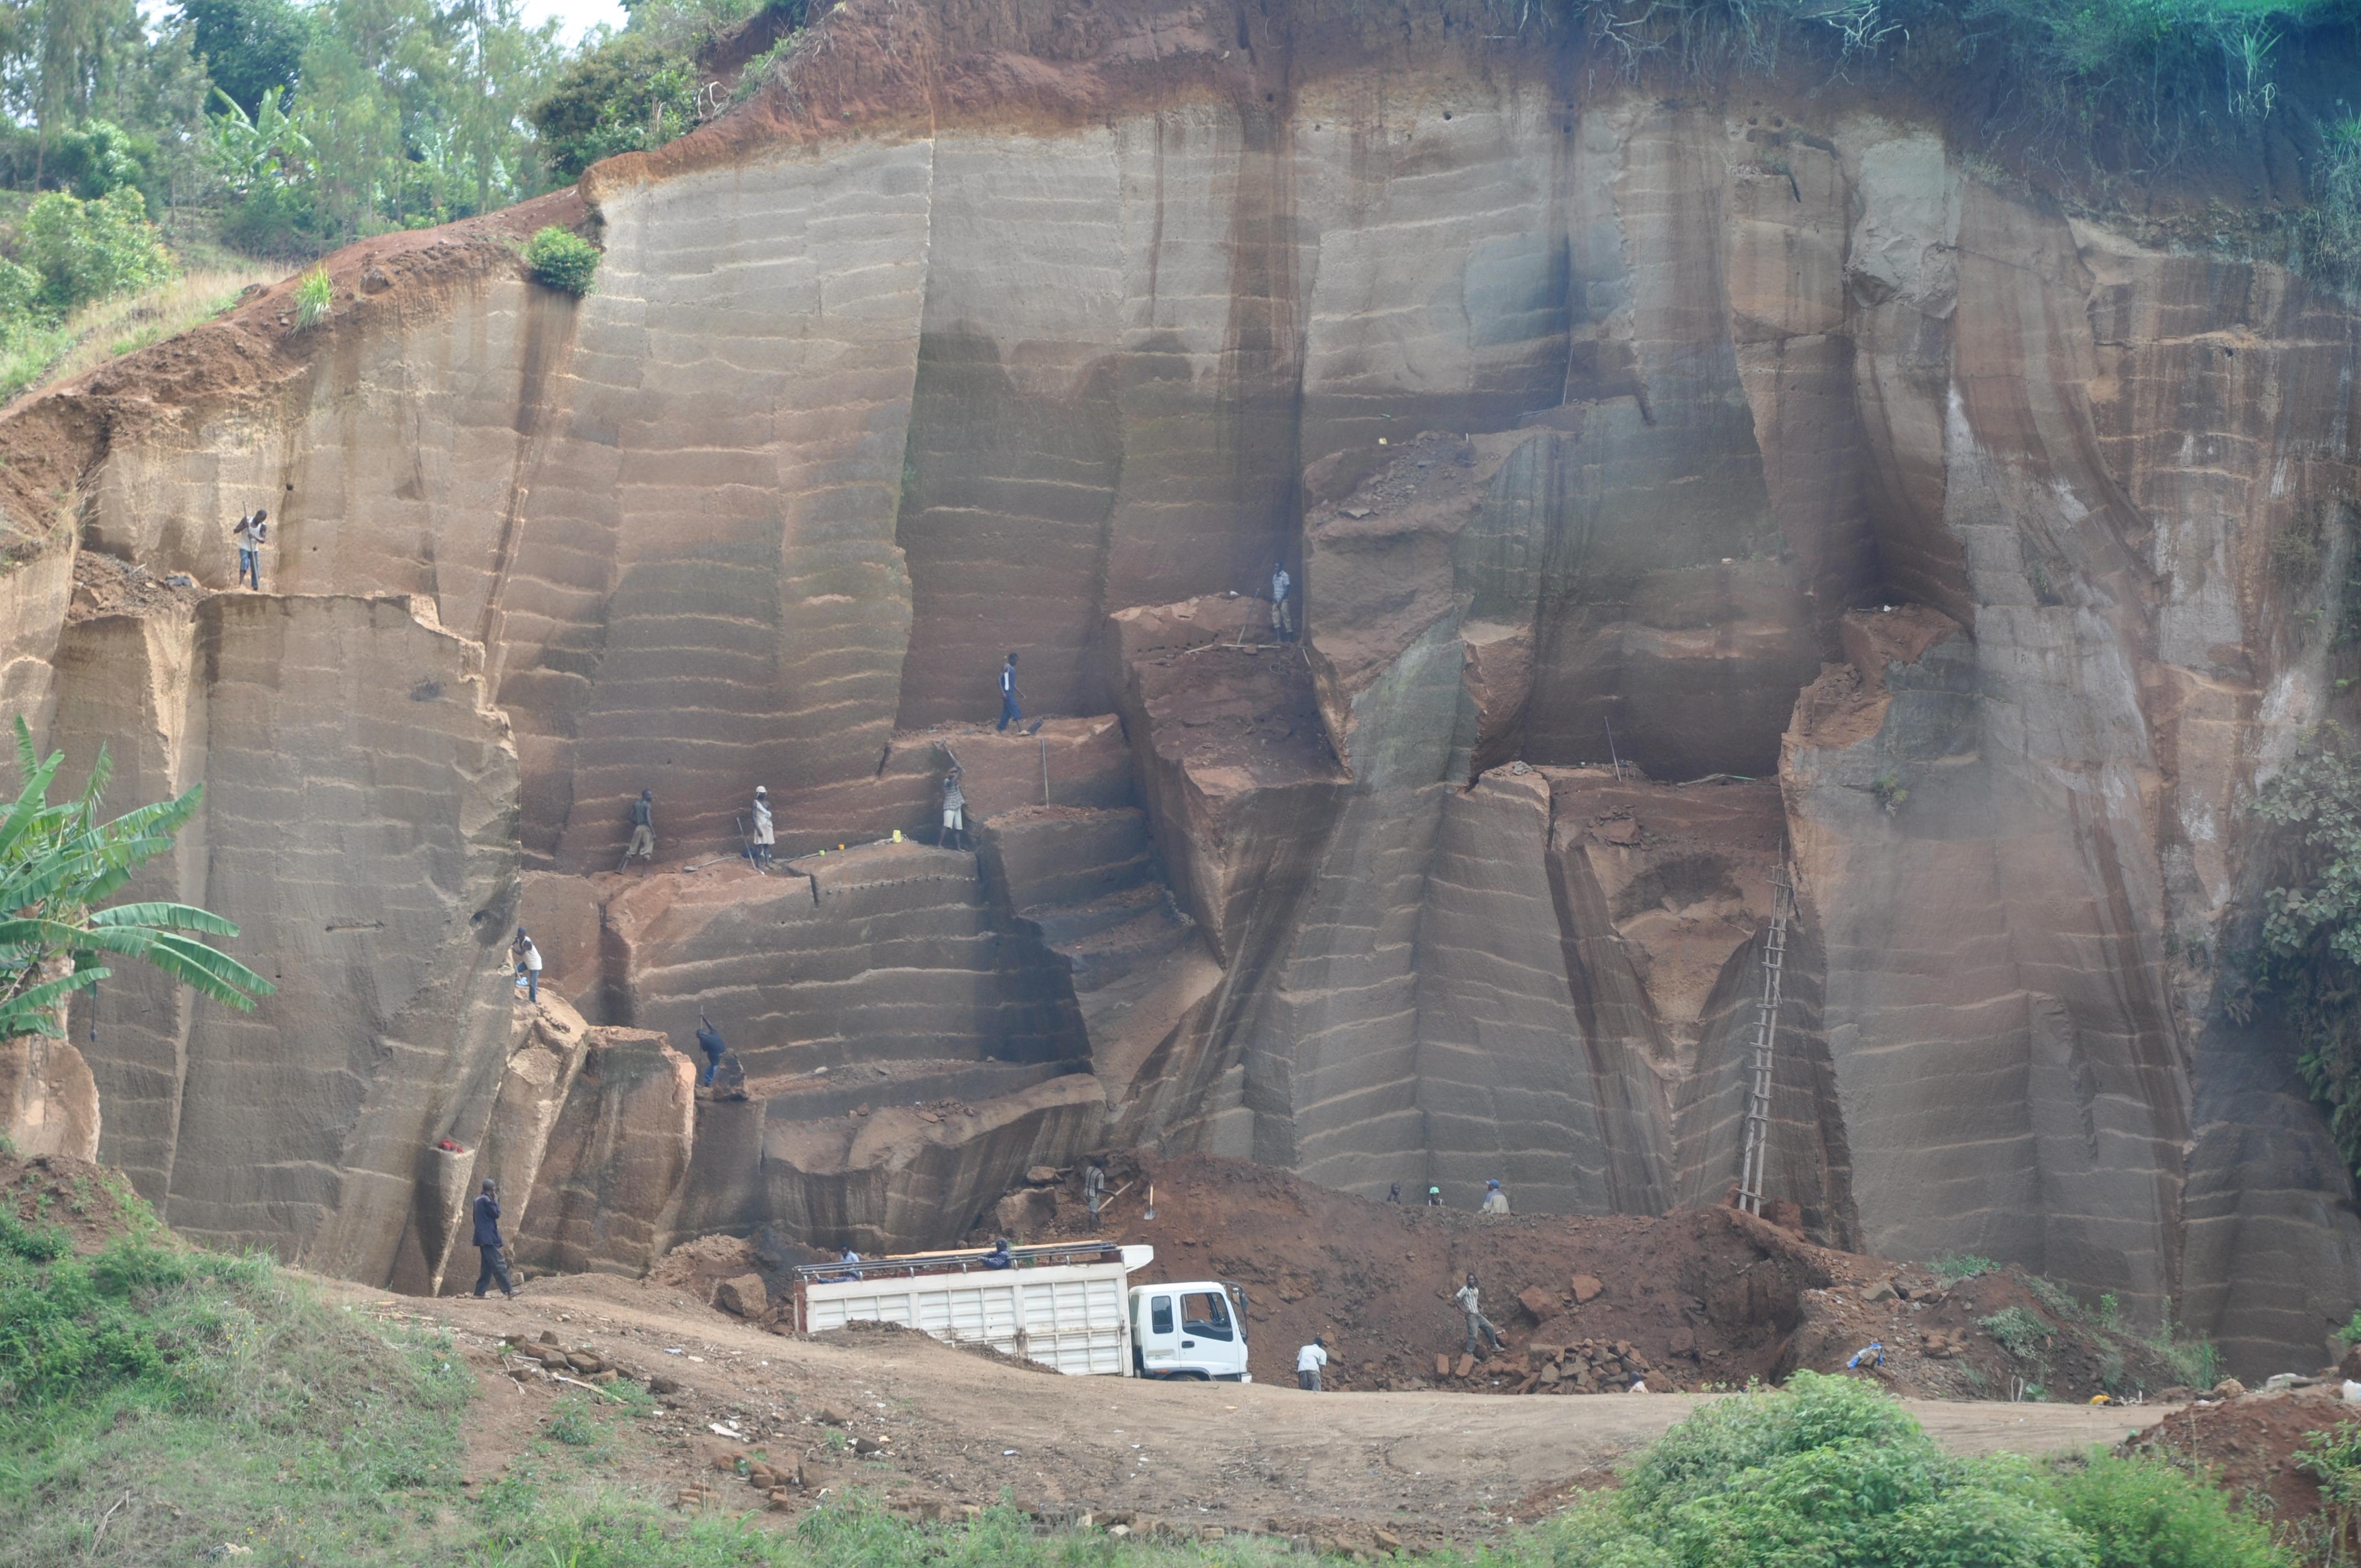 Rohstoffabbau in Afrika